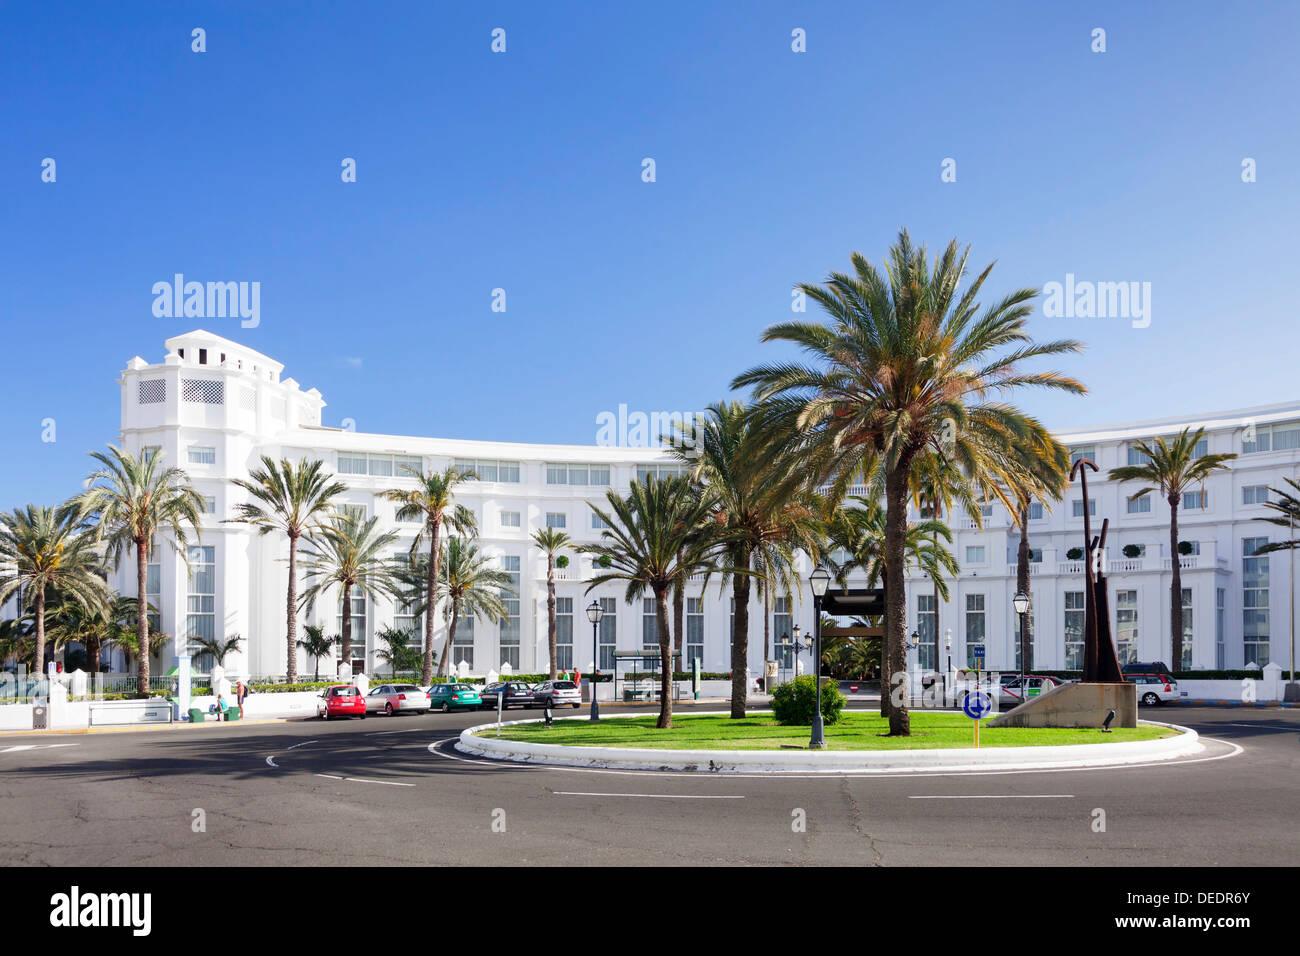 Hotel RIU Playa des Ingles, Gran Canaria, Kanarische Inseln, Spanien, Europa Stockbild